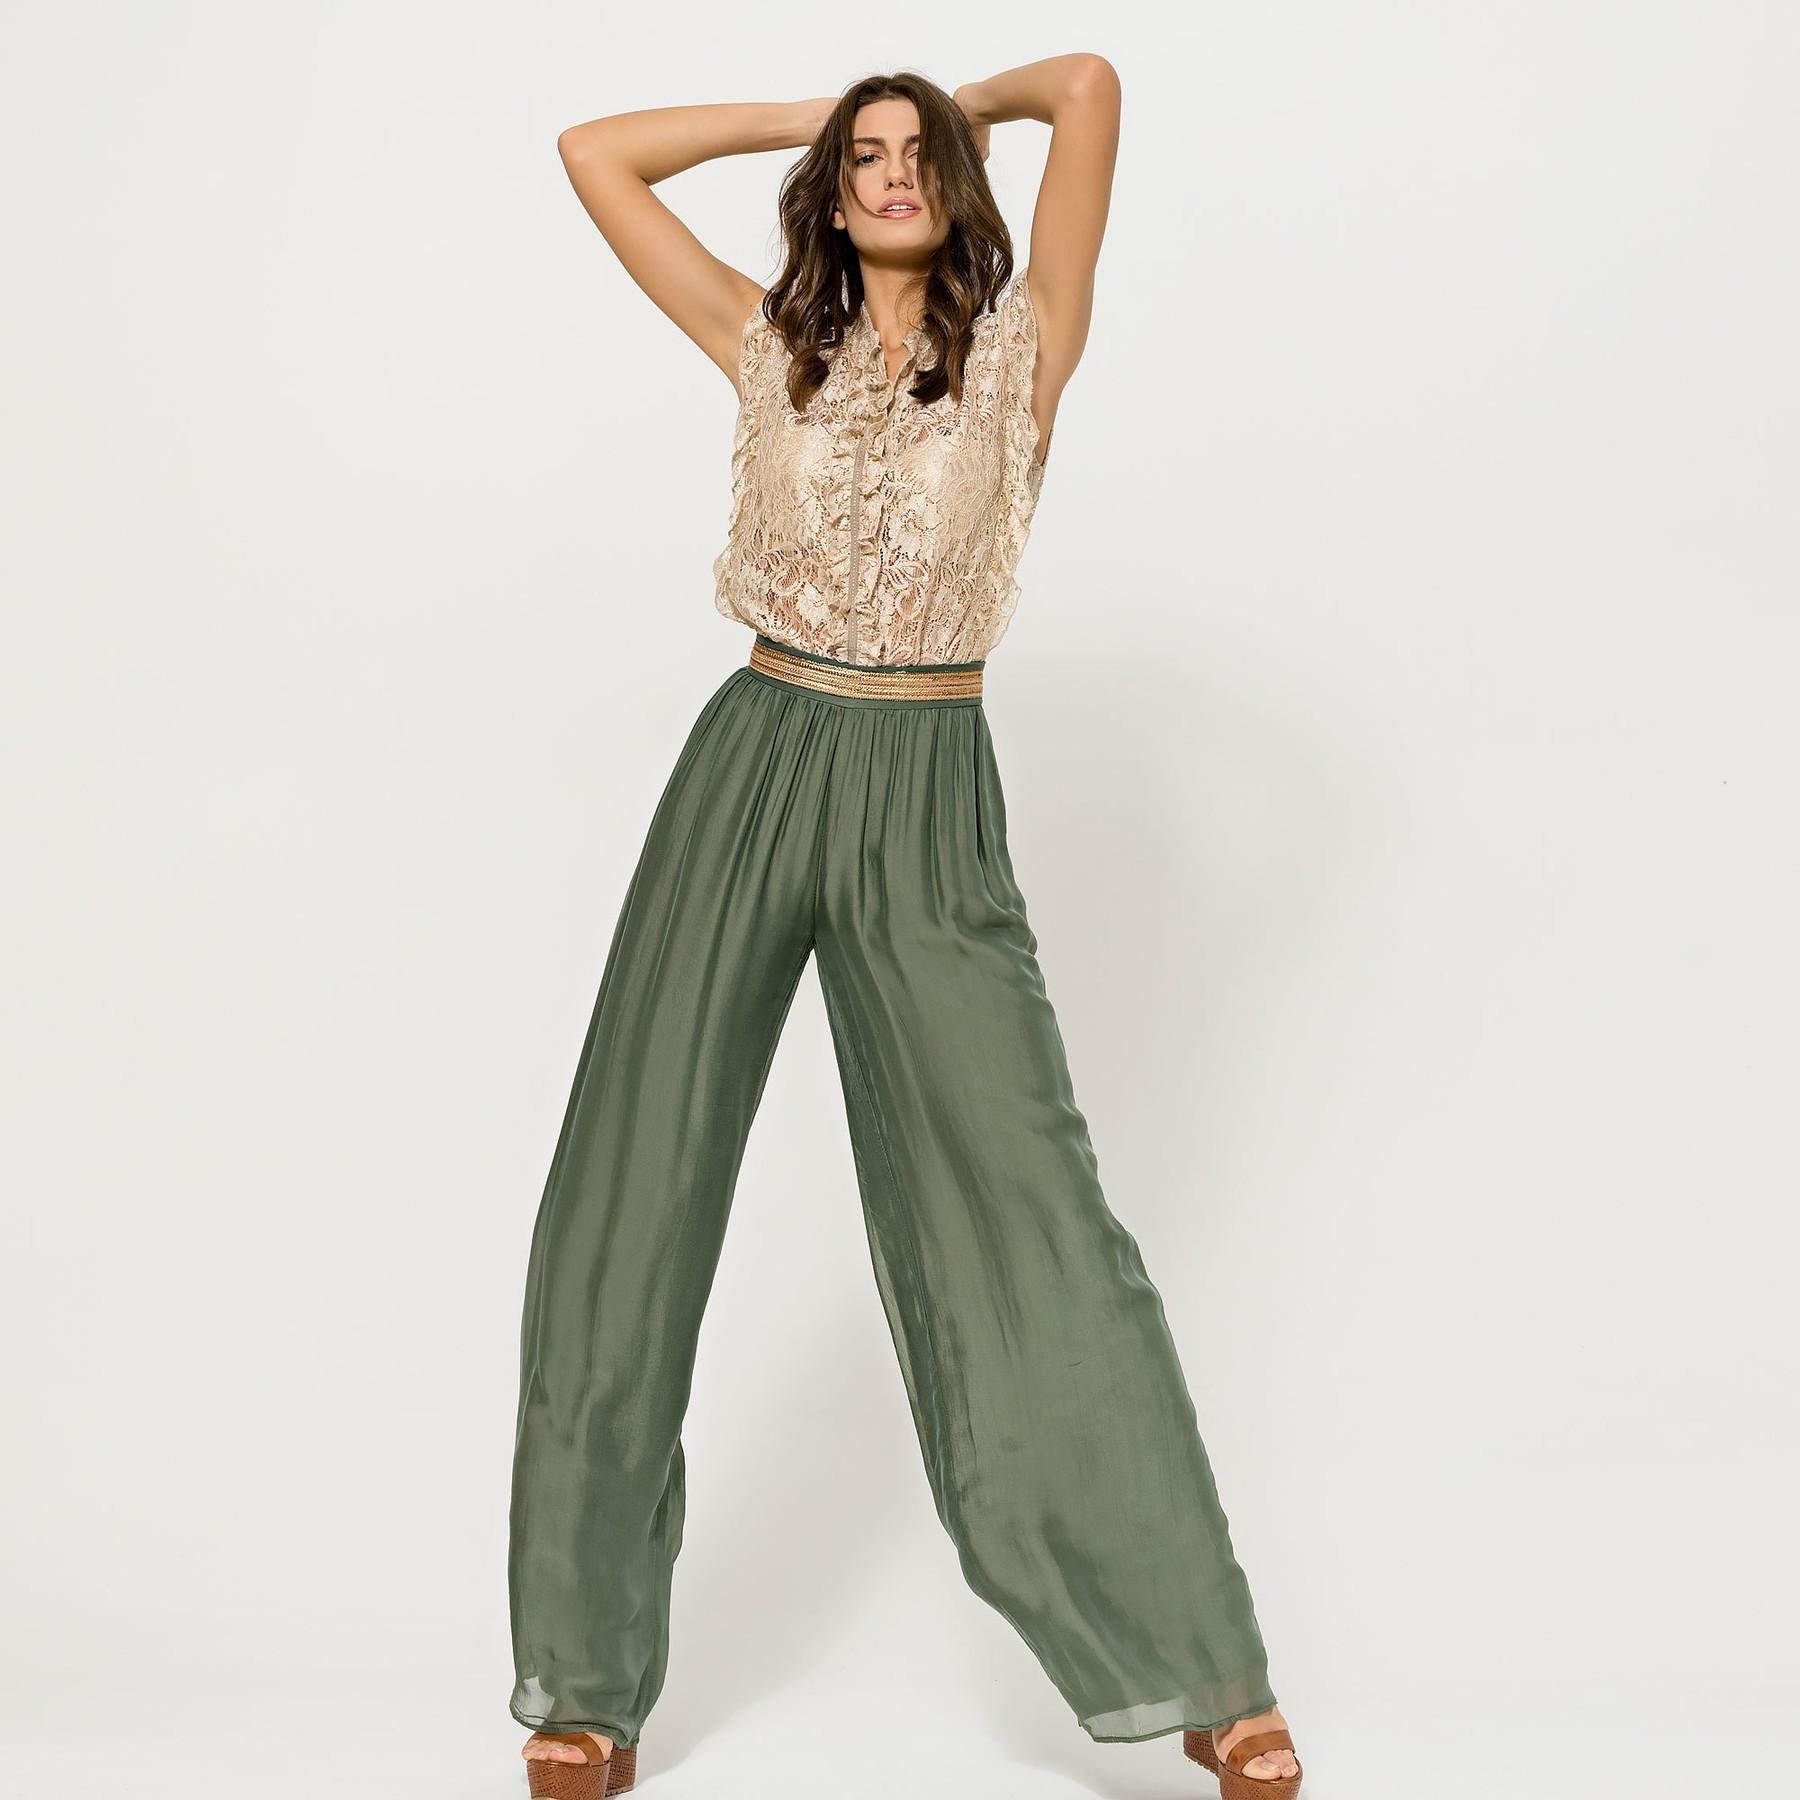 Silky Muslin Feel Khaki Trousers ACCTROUKHAK